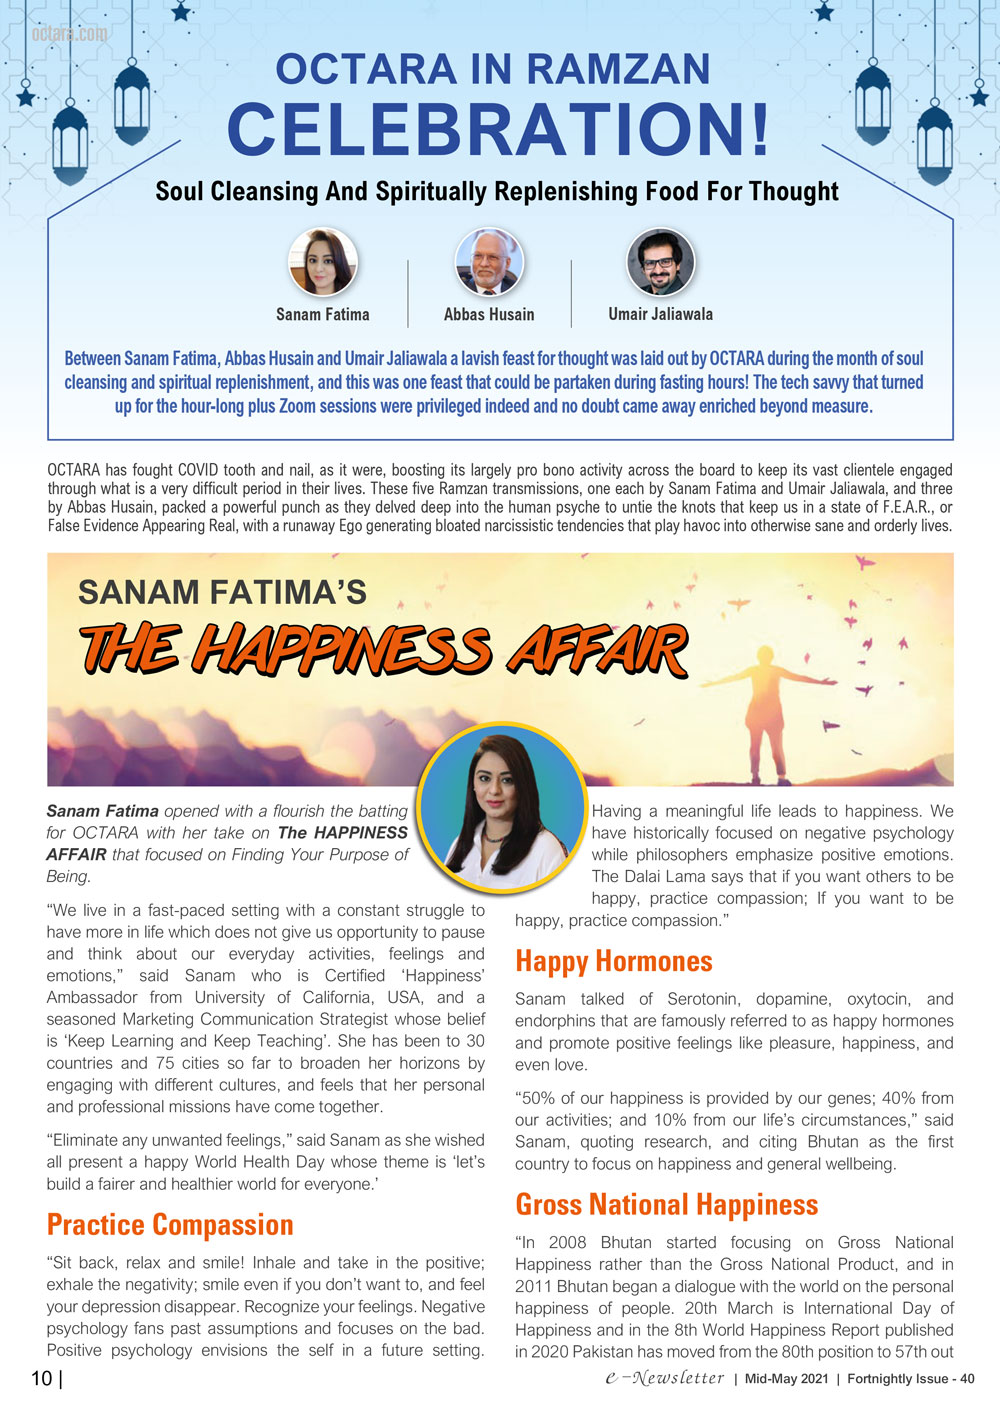 Happiness Affair 1